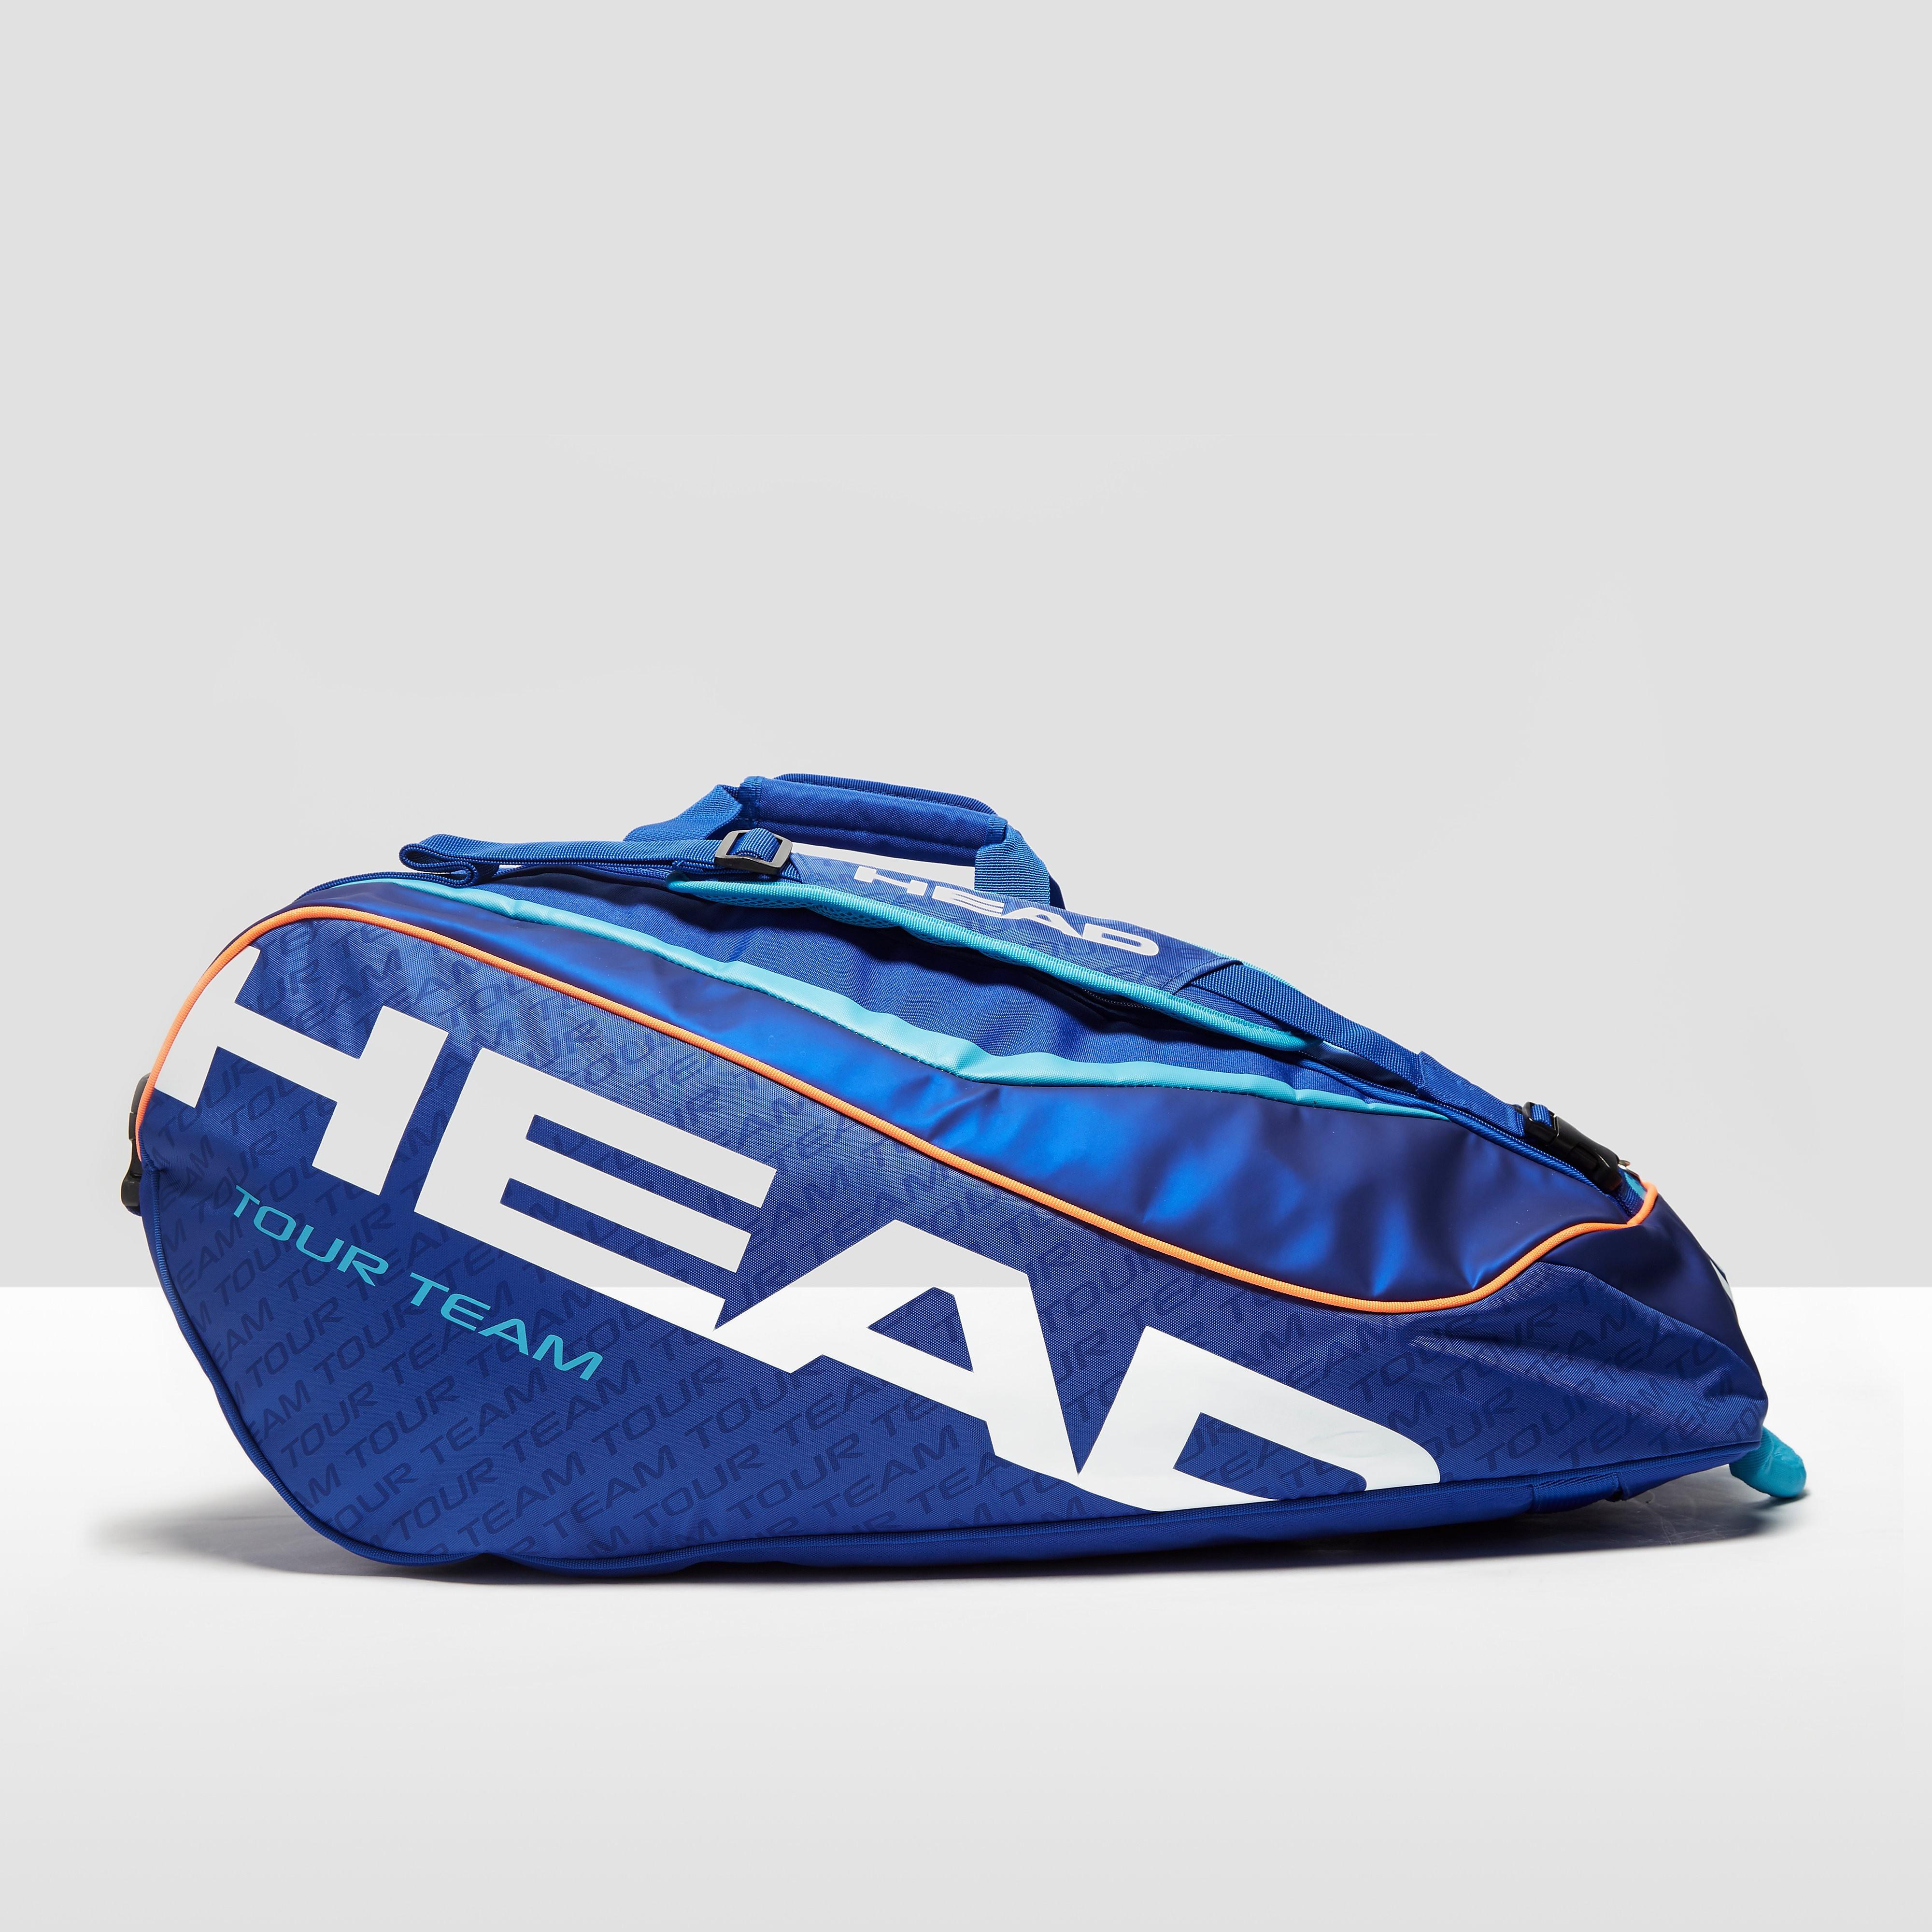 Head 12R TOUR MONSTERCOMBI RACKET BAG